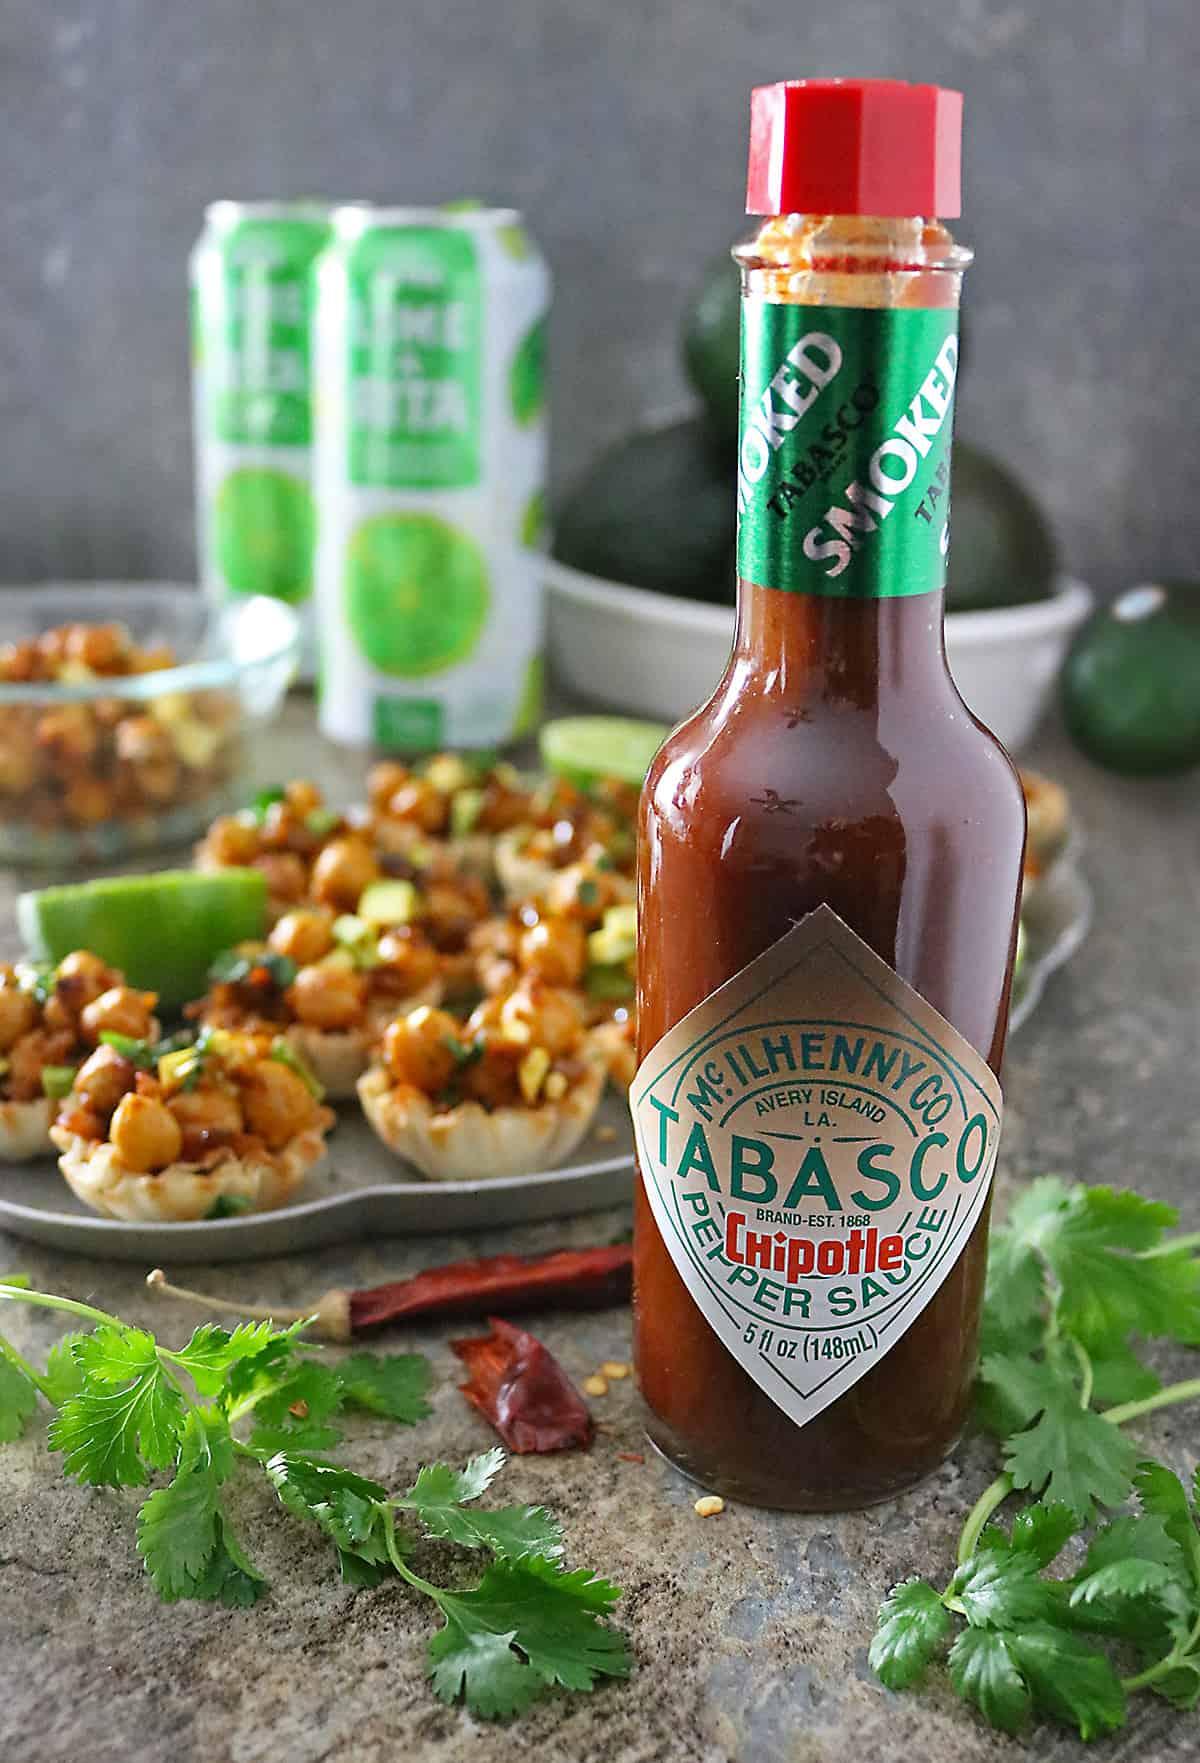 Tasty TABASCO Brand Sauce